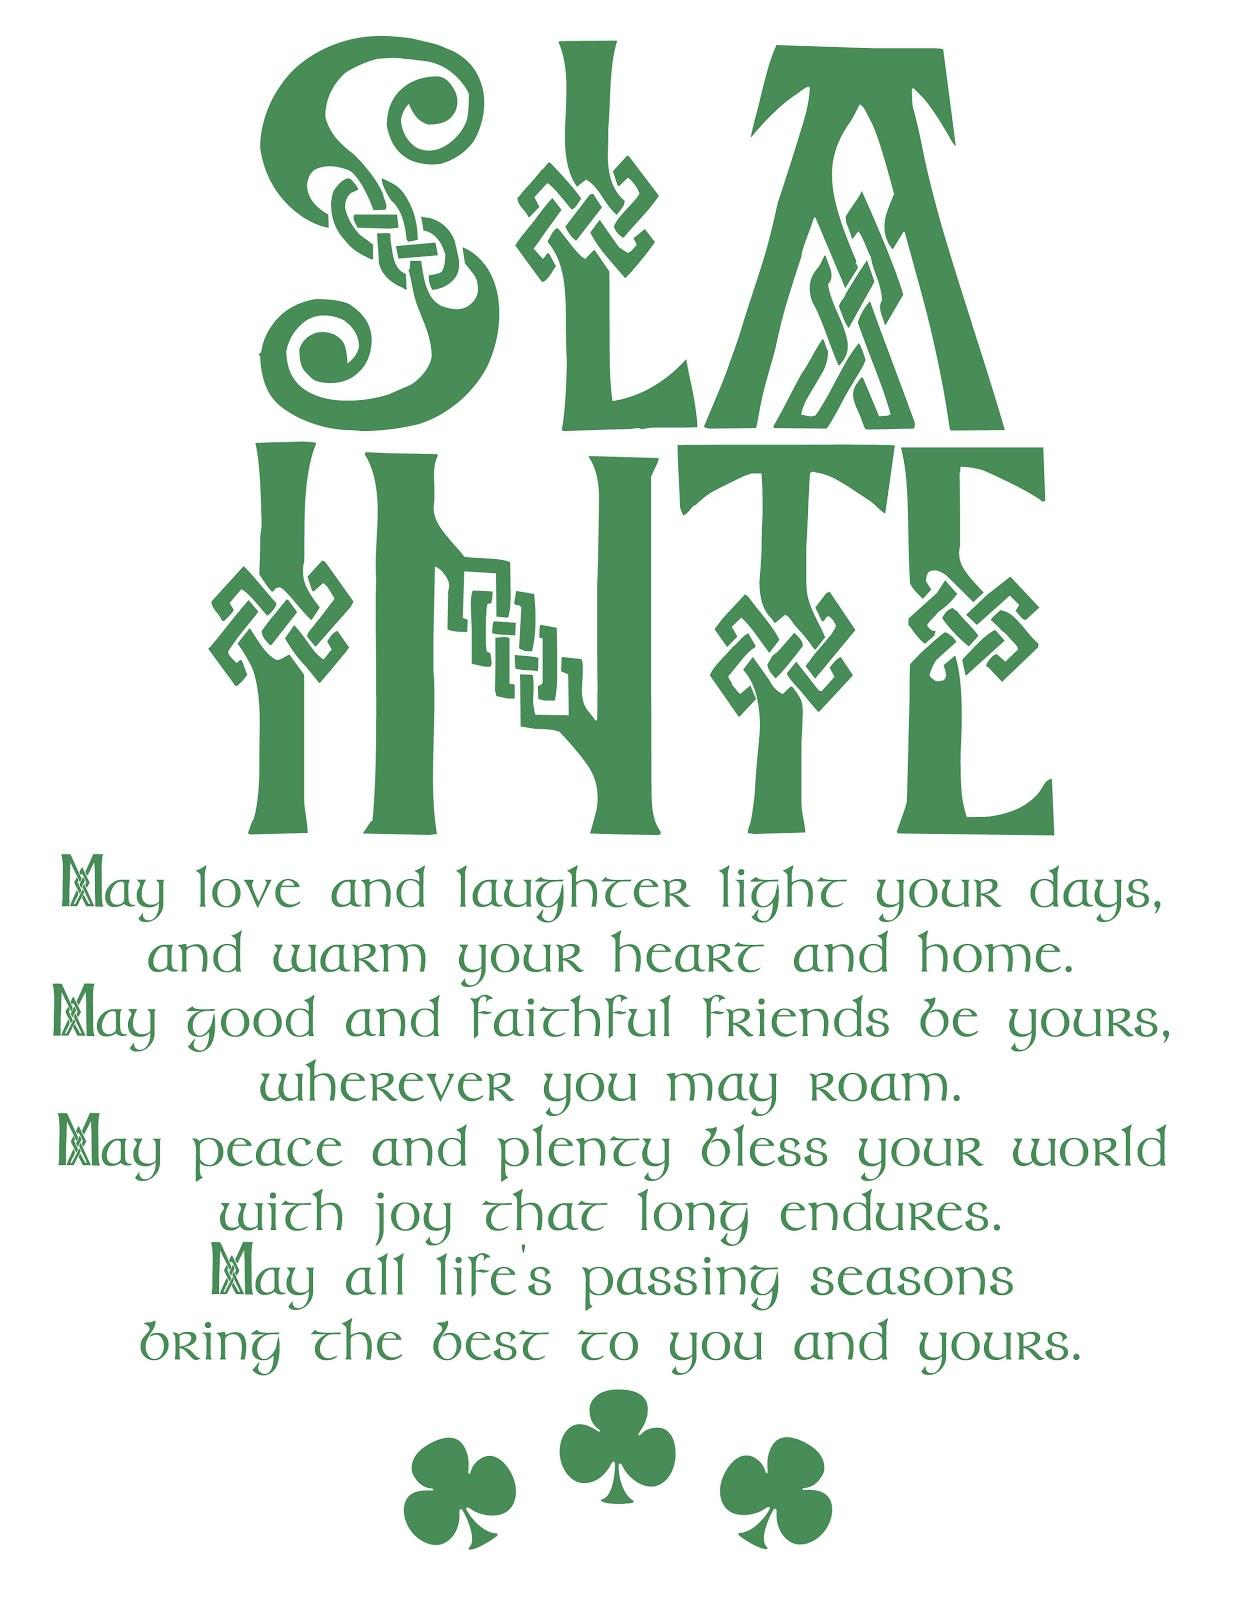 St Patricks Day Limericks And Poems